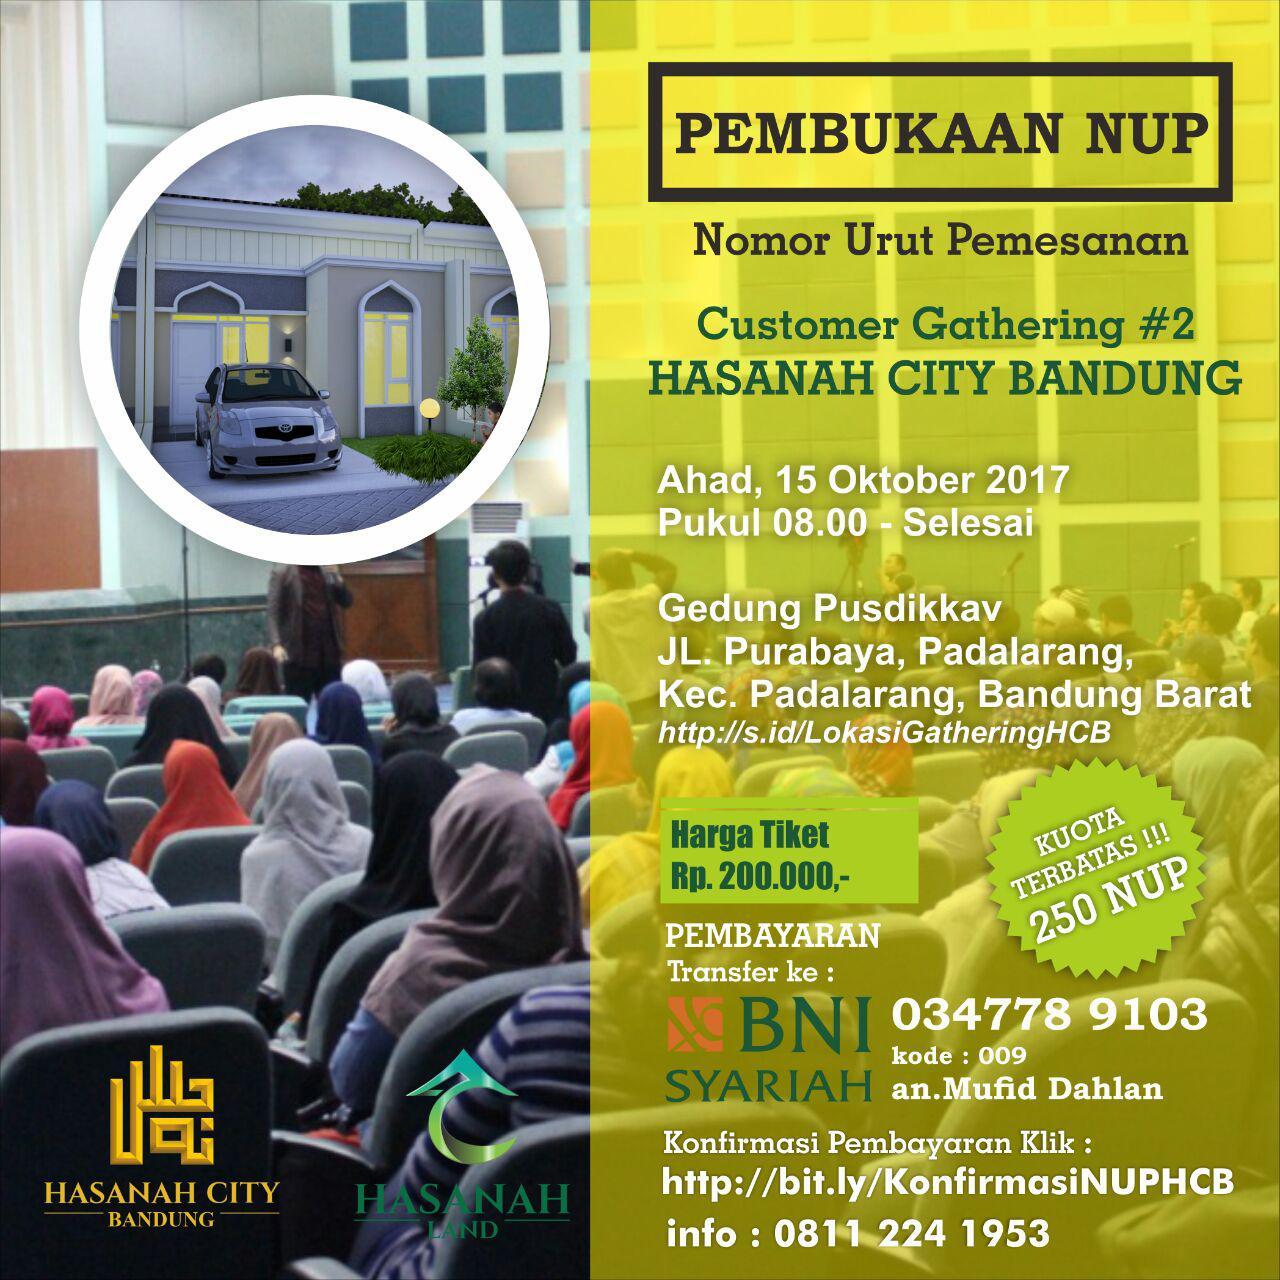 Pembukaan Pendaftaran NUP Mega Gathering Hasanah City bandung15Oktober2017